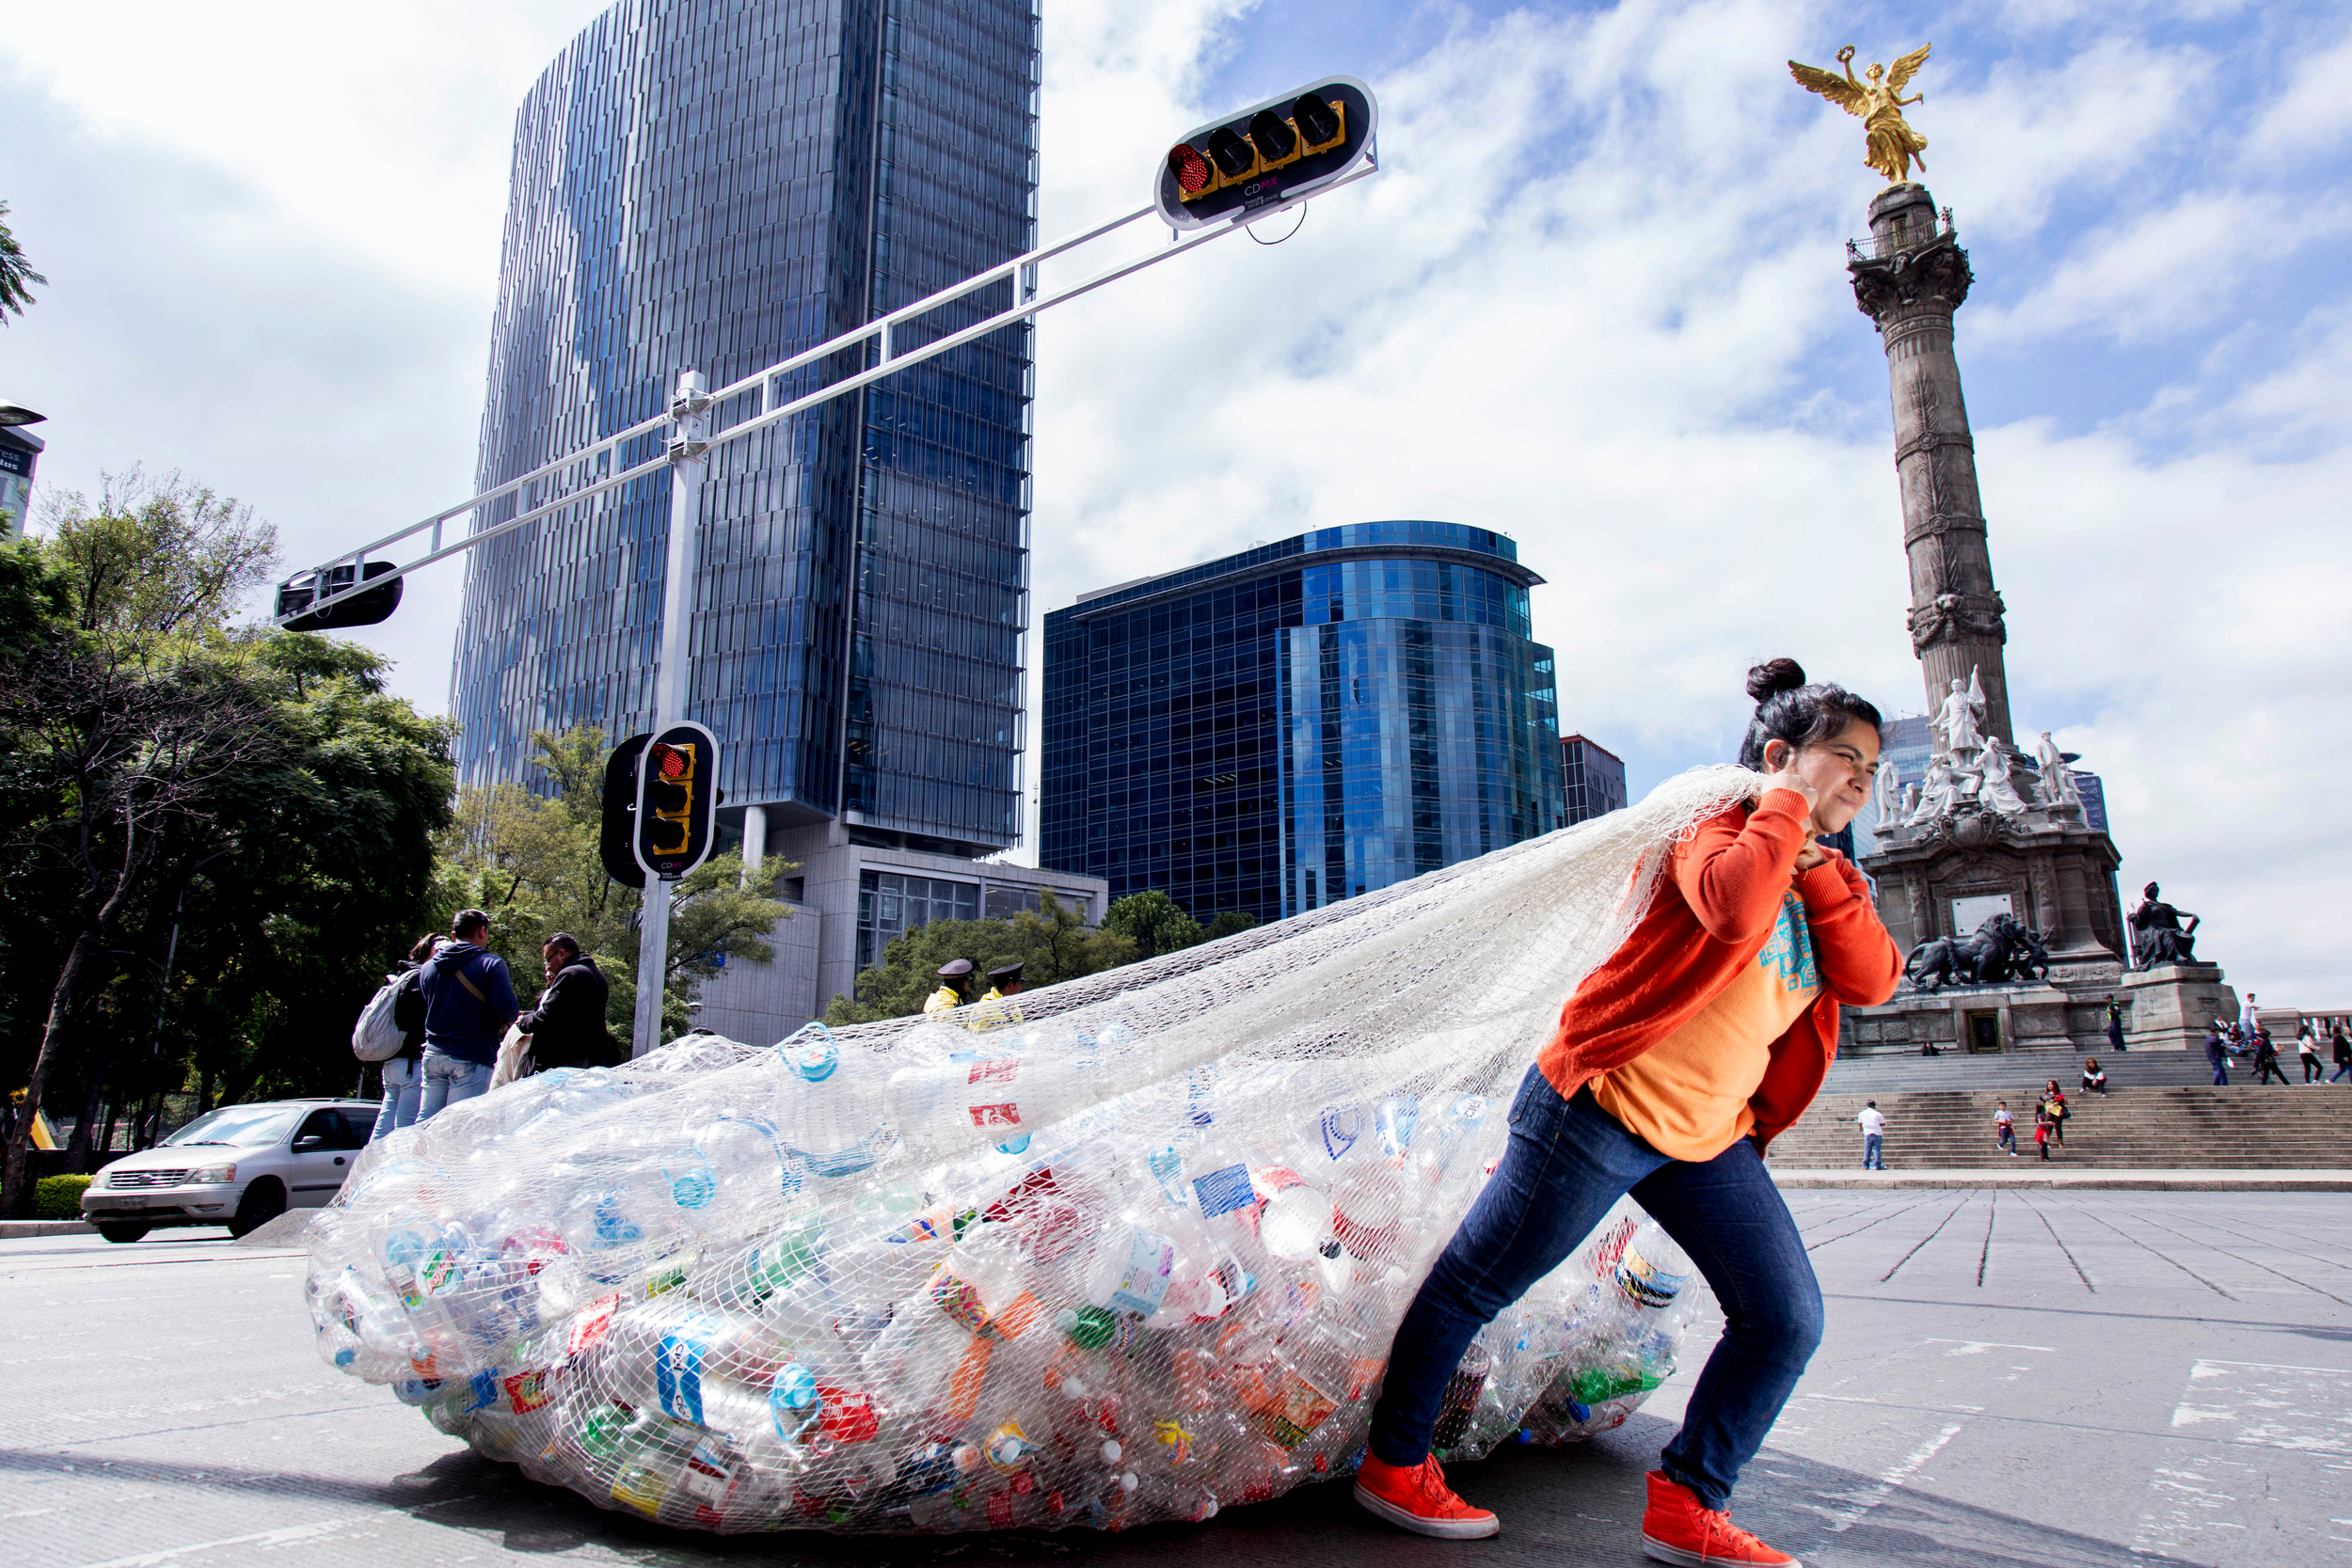 Plastics in Mexico City © Argelia Zacatzi / Greenpeace